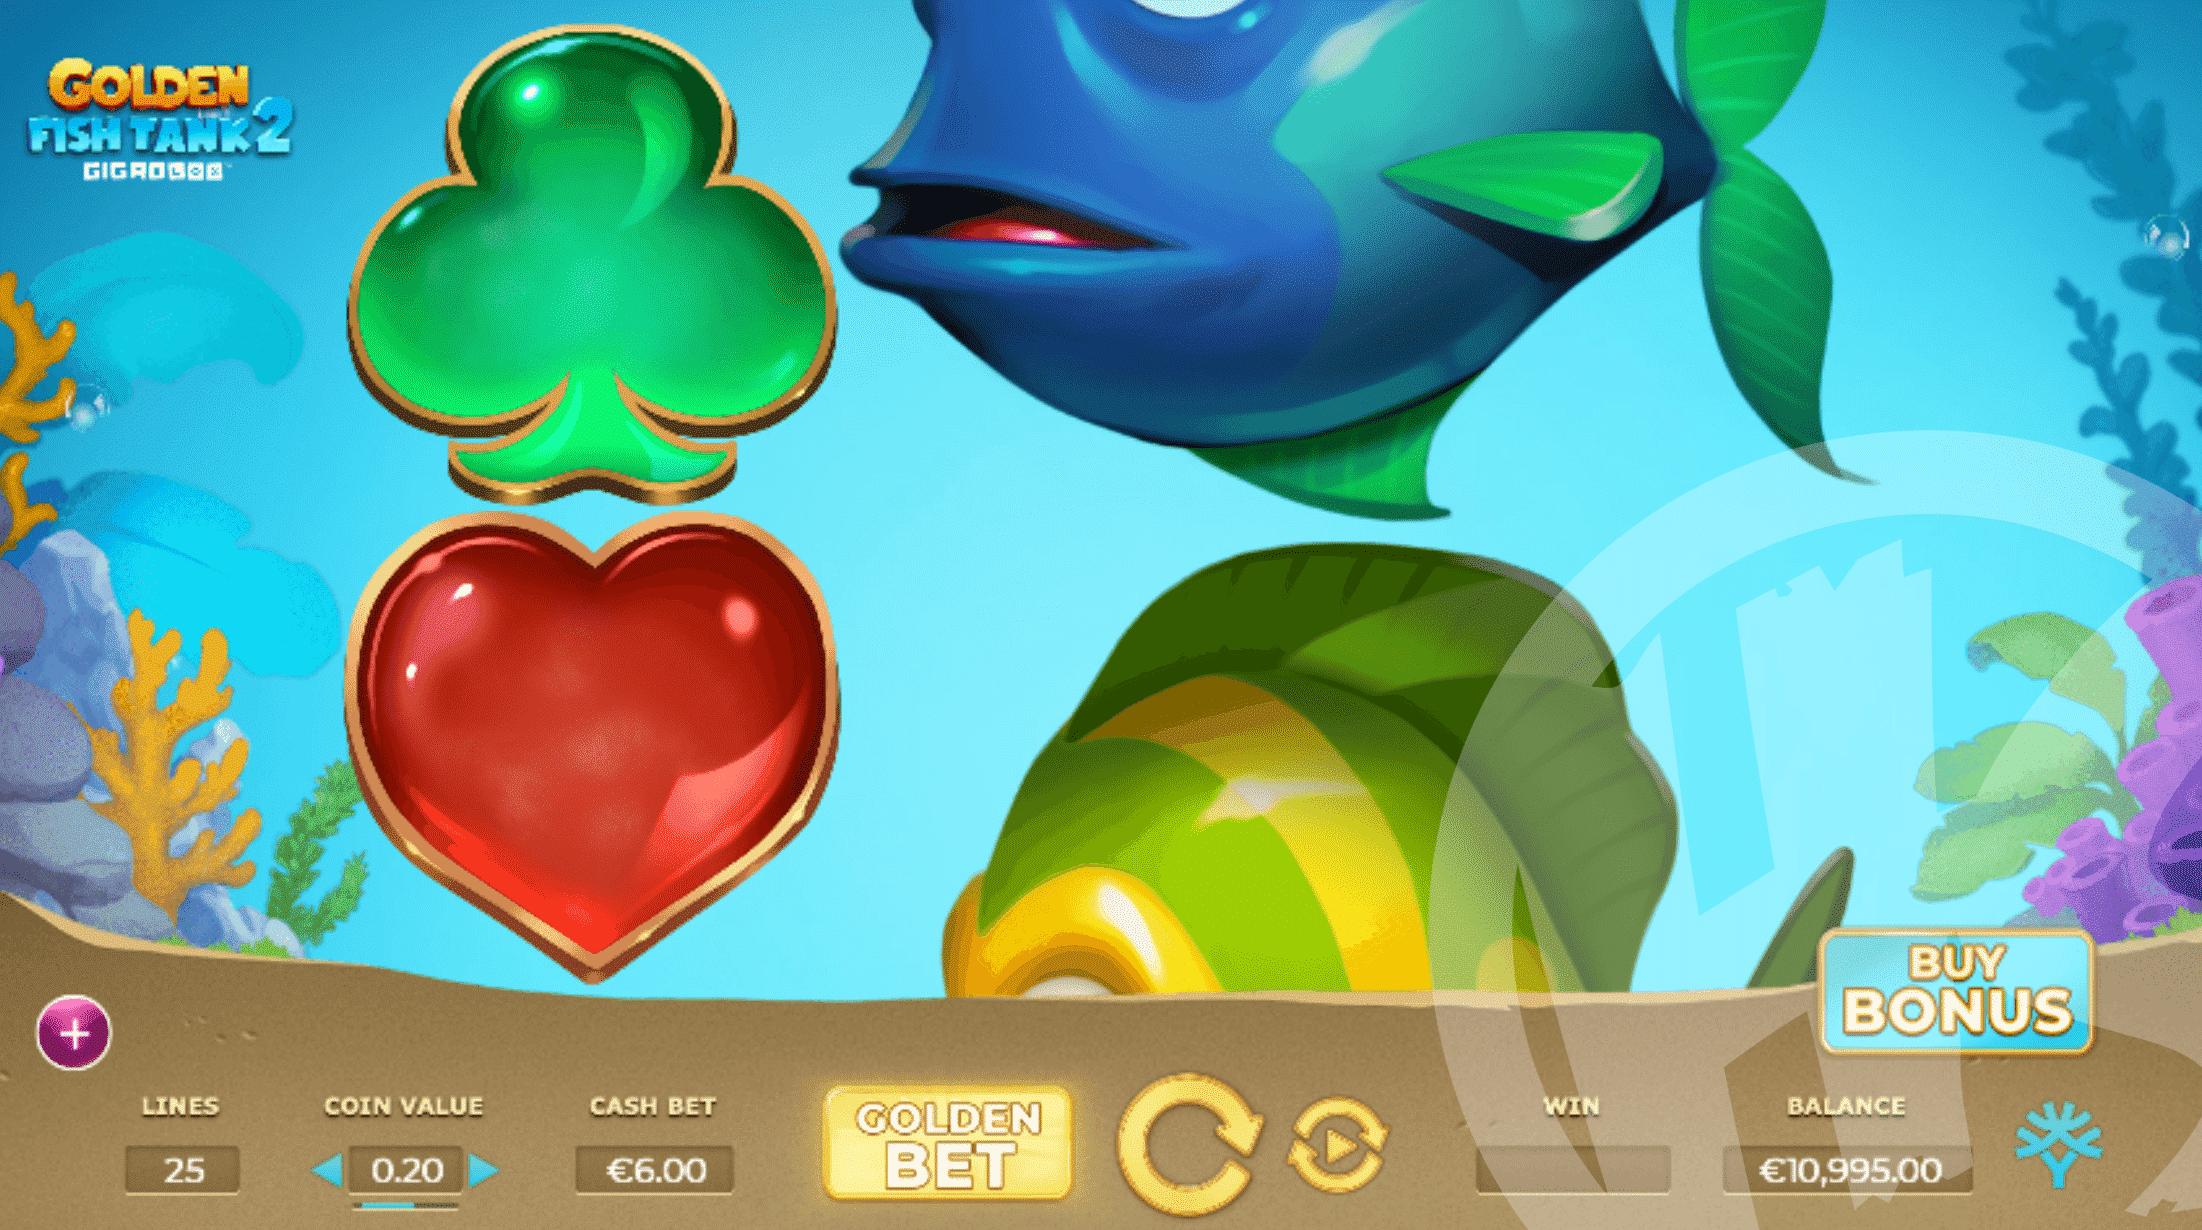 Golden Fish Tank 2 Gigablox Features 25 Paylines